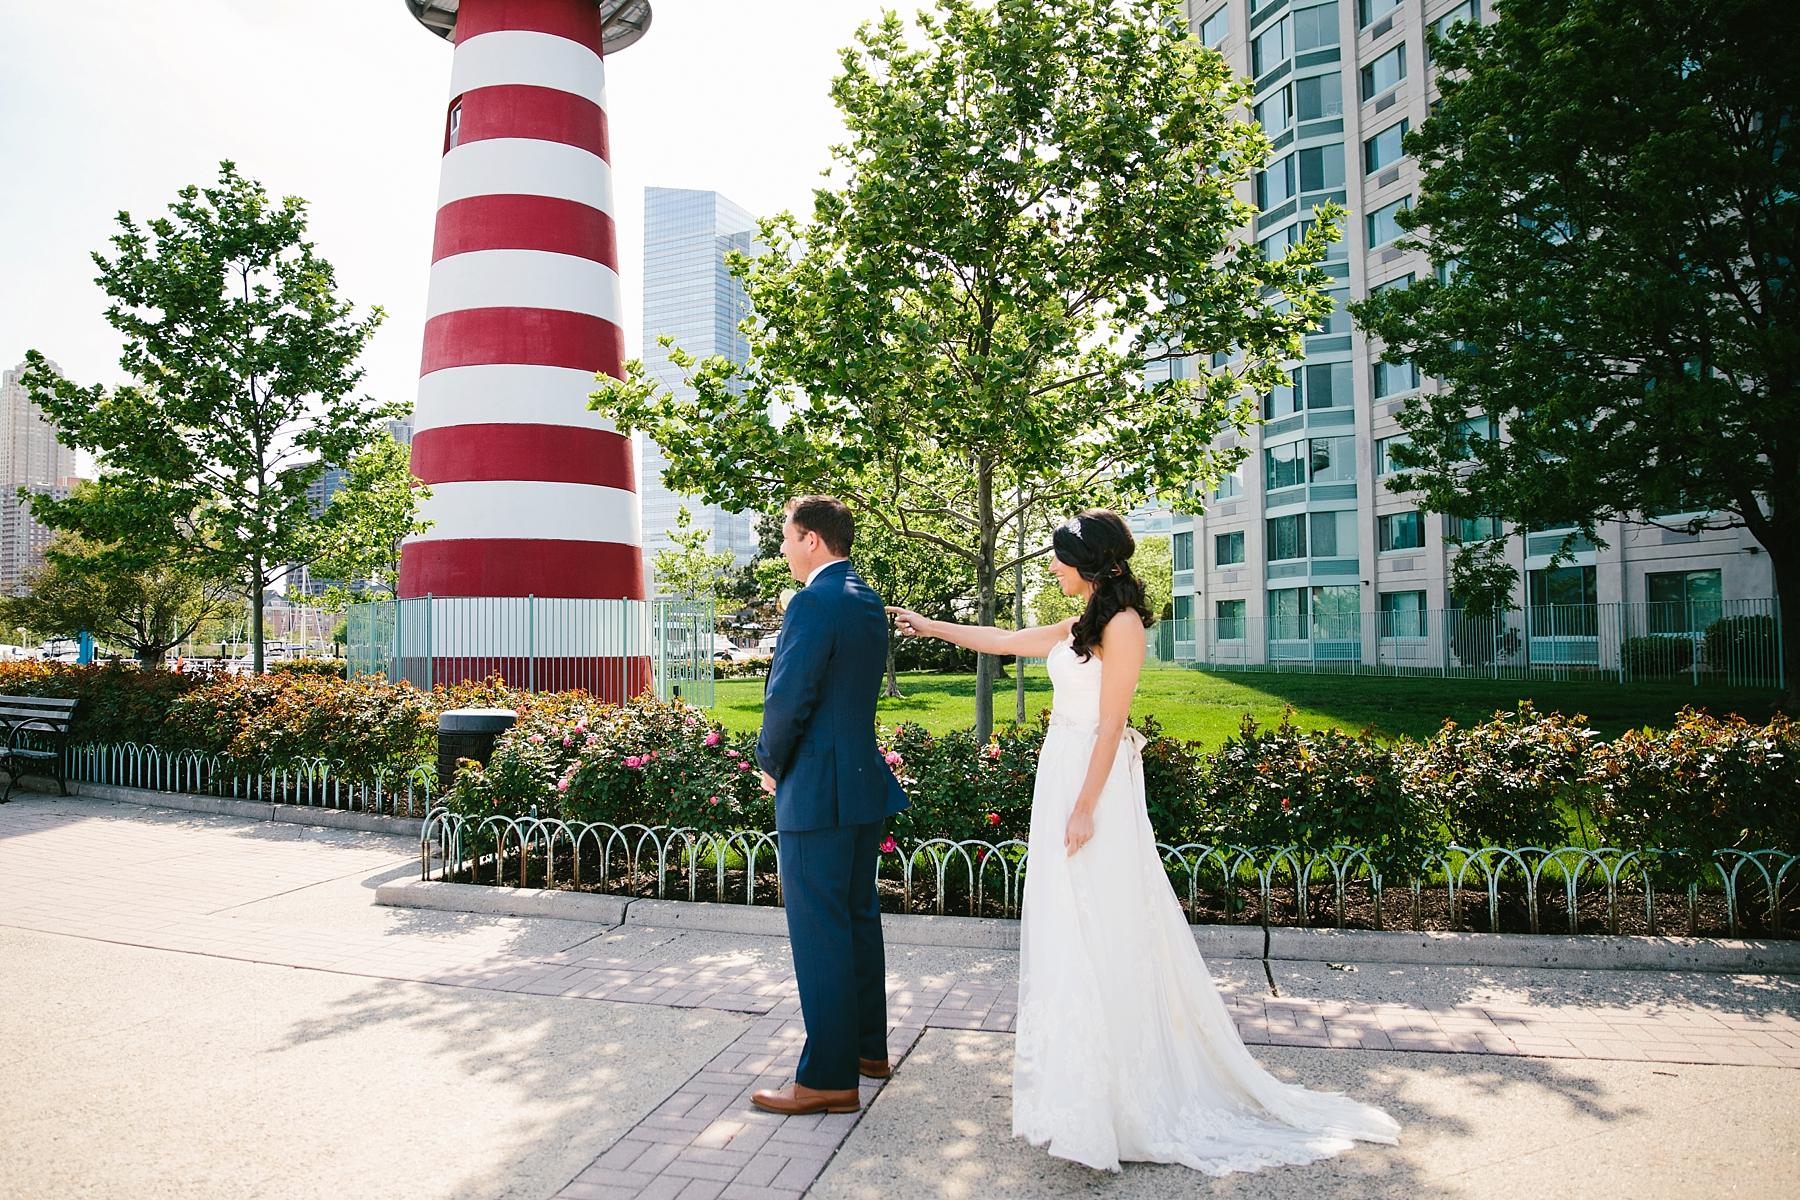 liberty-state-park-wedding-photographer-ny-nj_0015.jpg